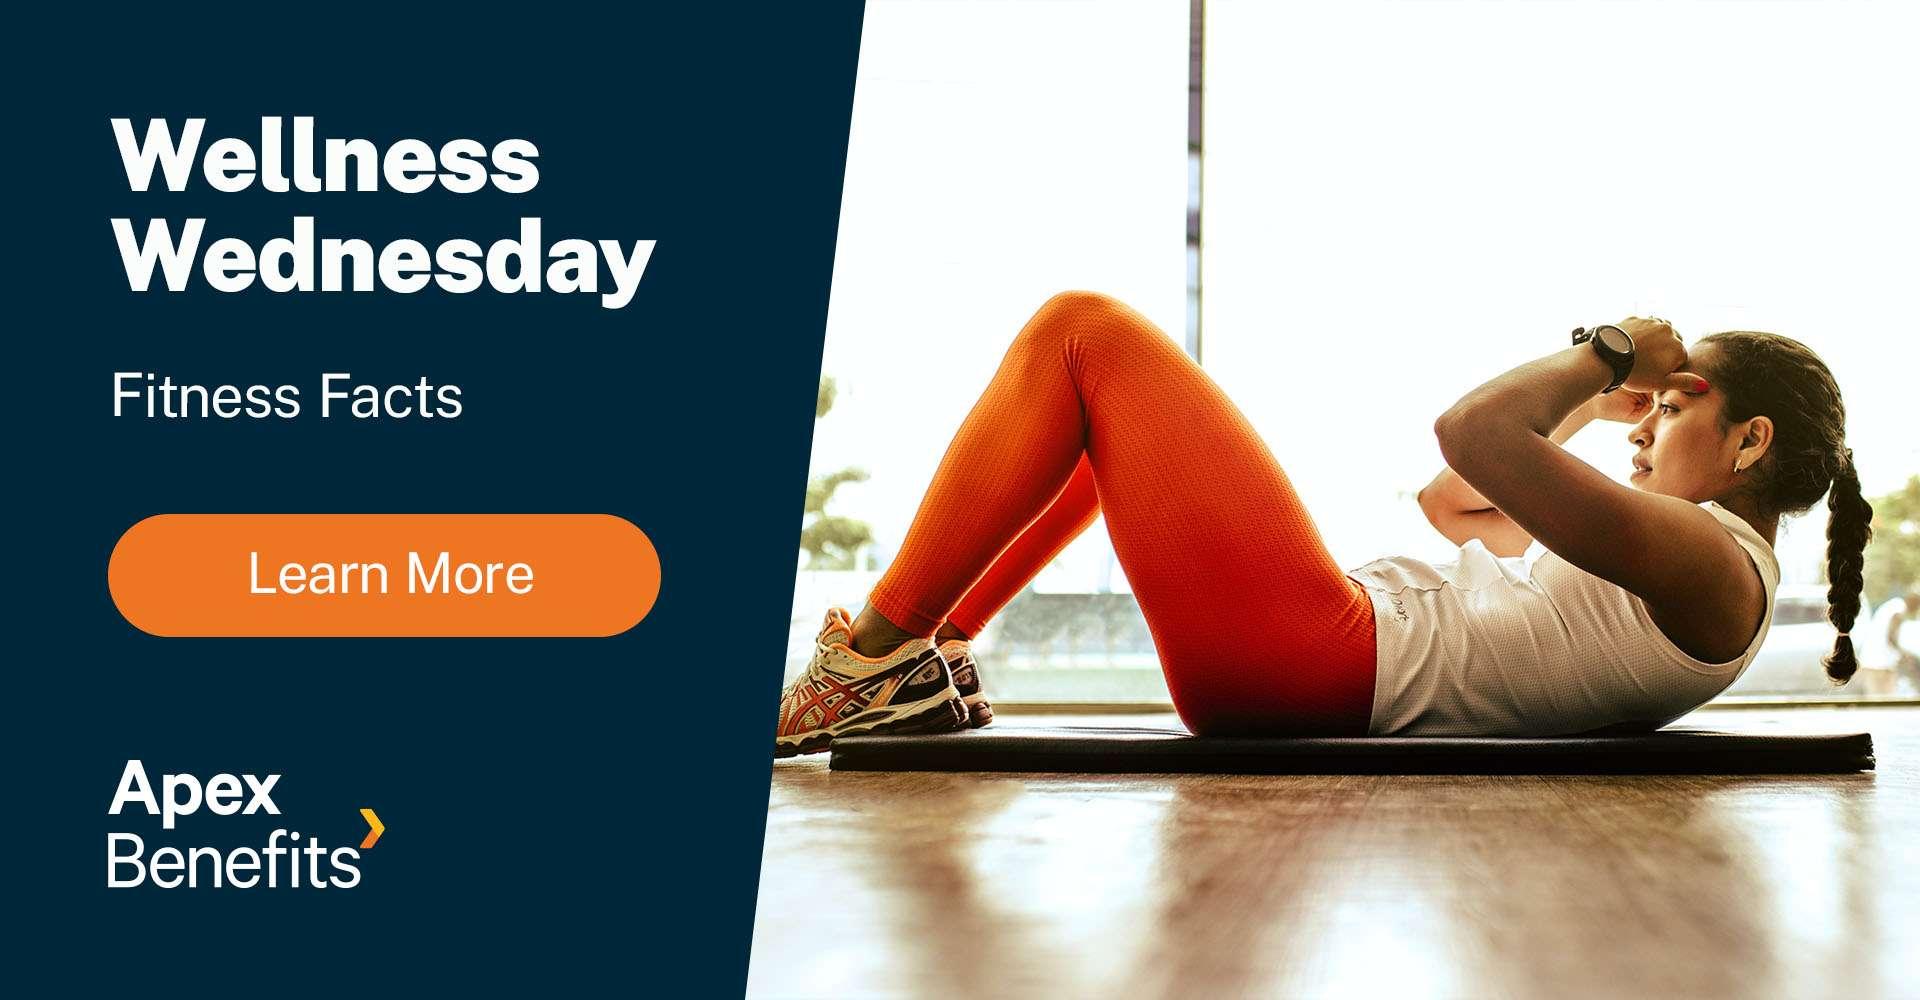 Wellness Wednesday: Fitness Facts